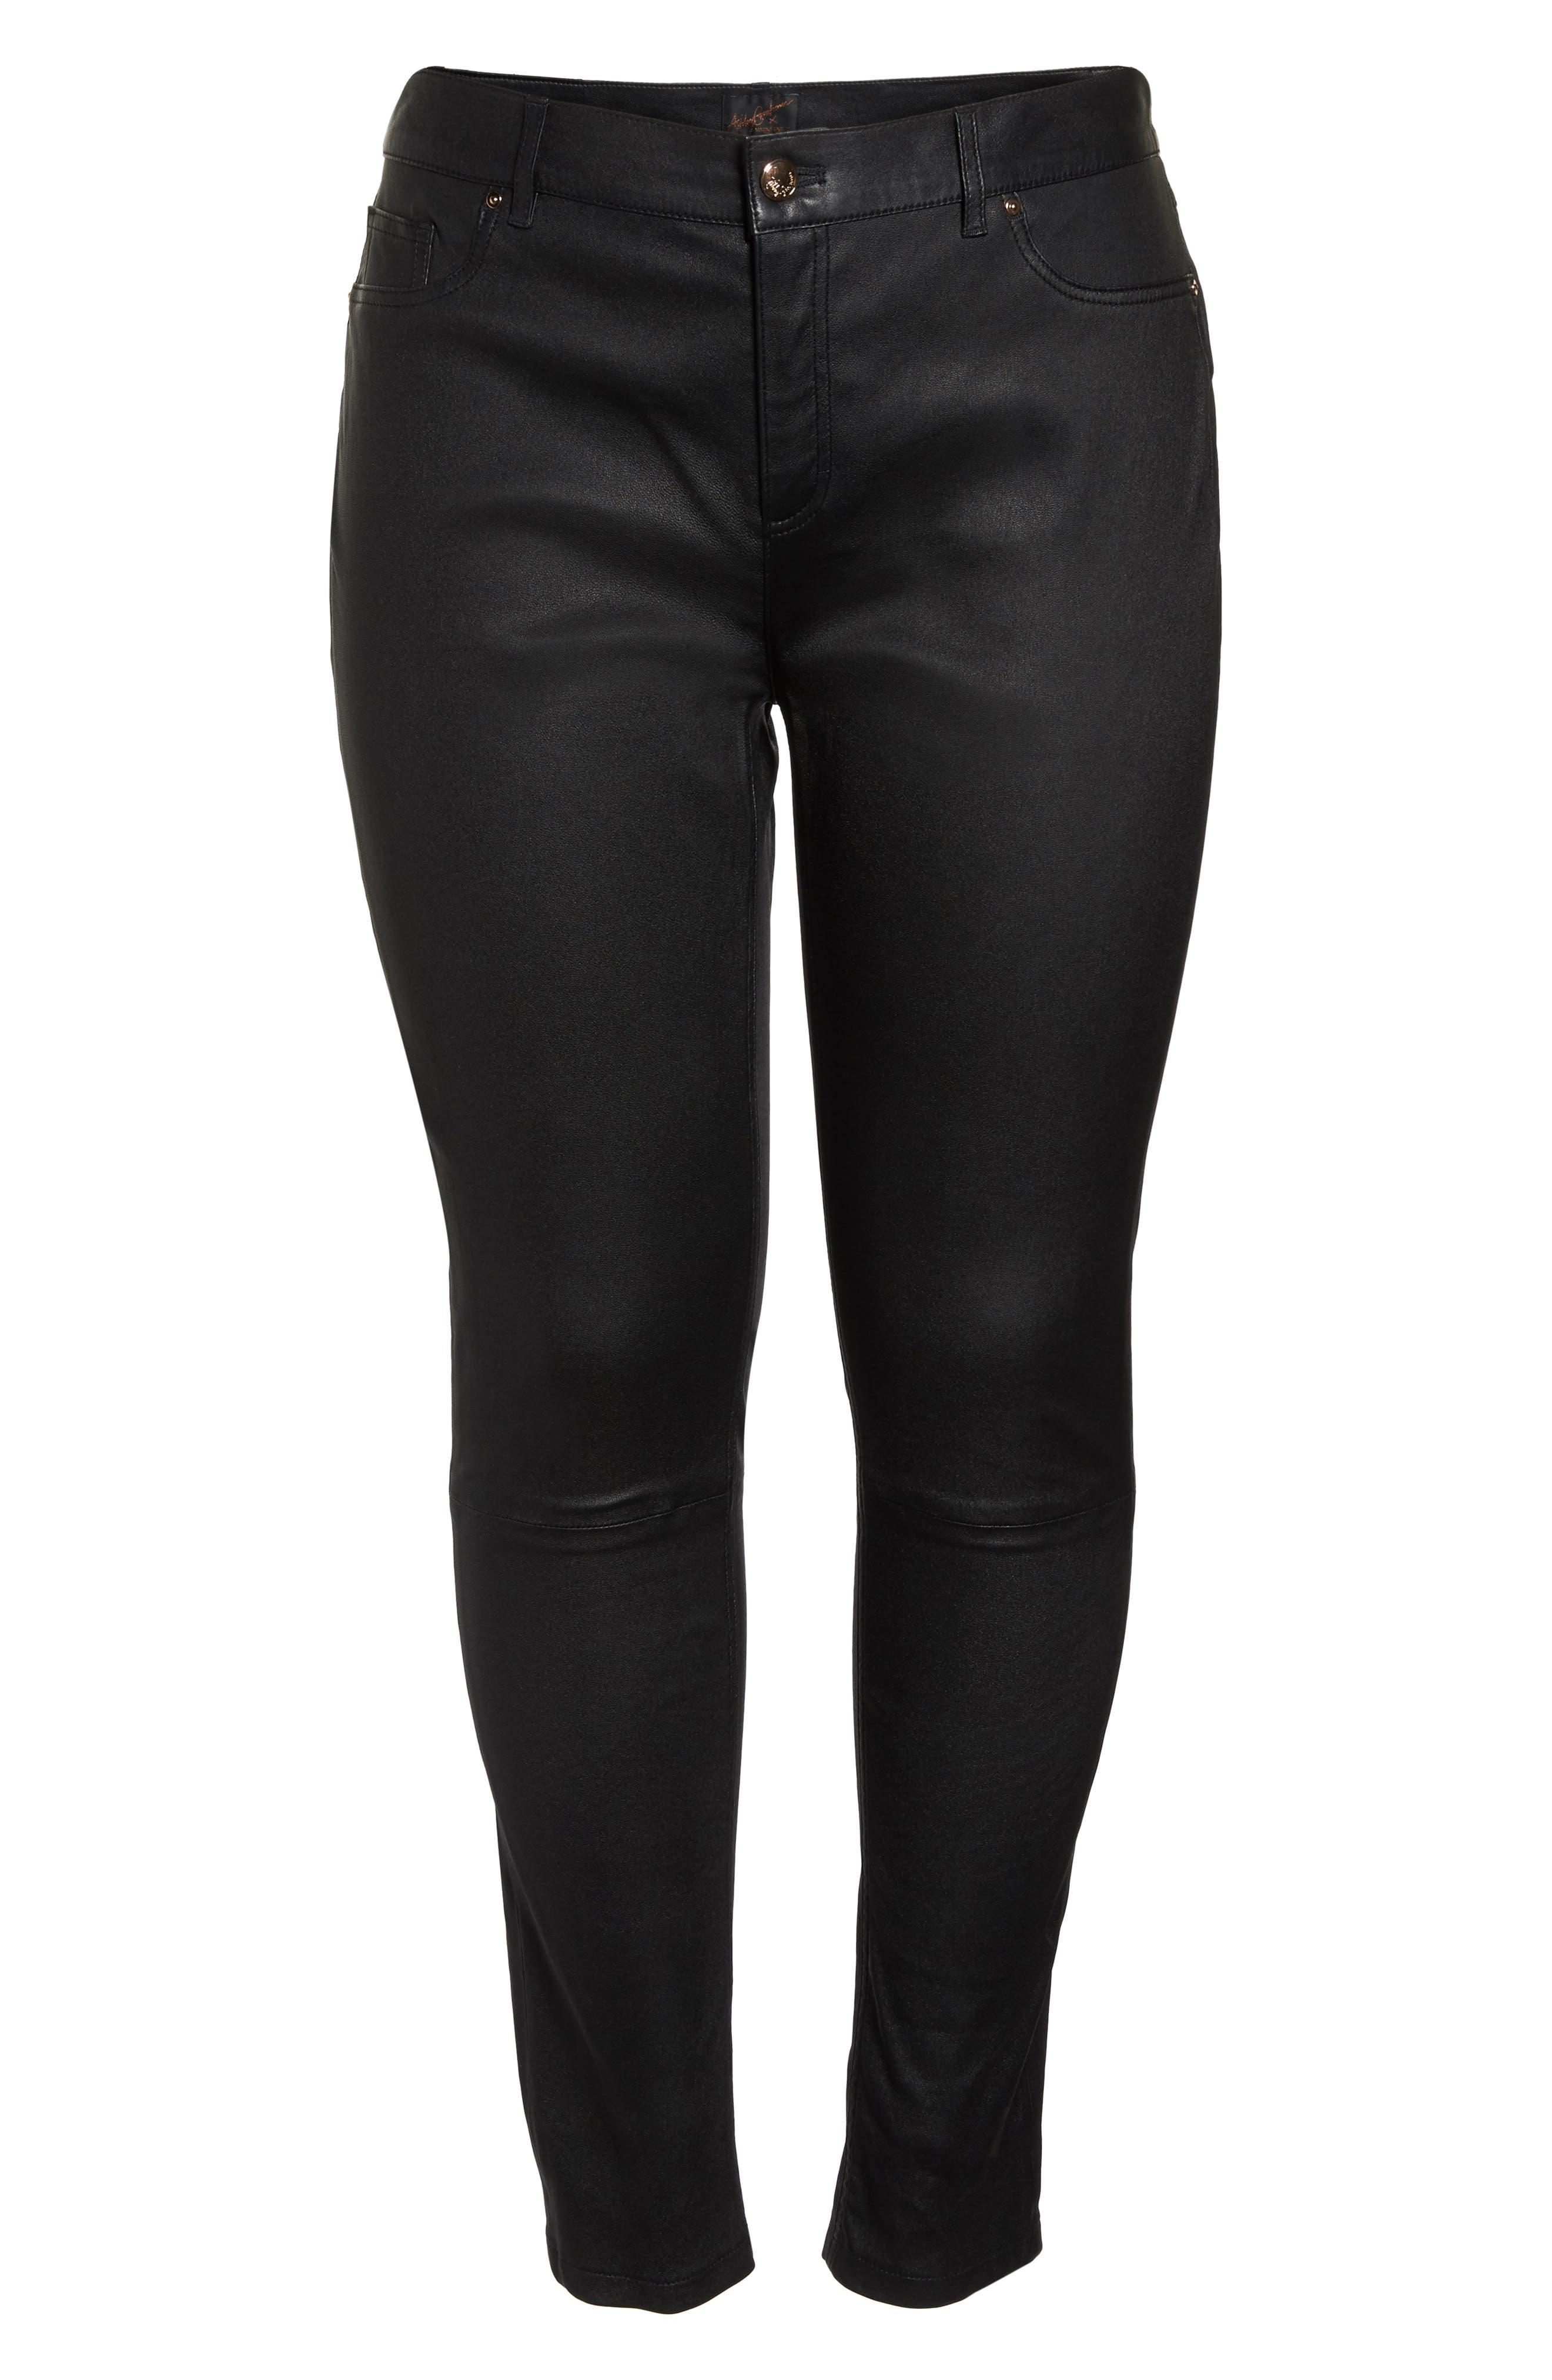 Eboli Leather Pants,                             Alternate thumbnail 7, color,                             001